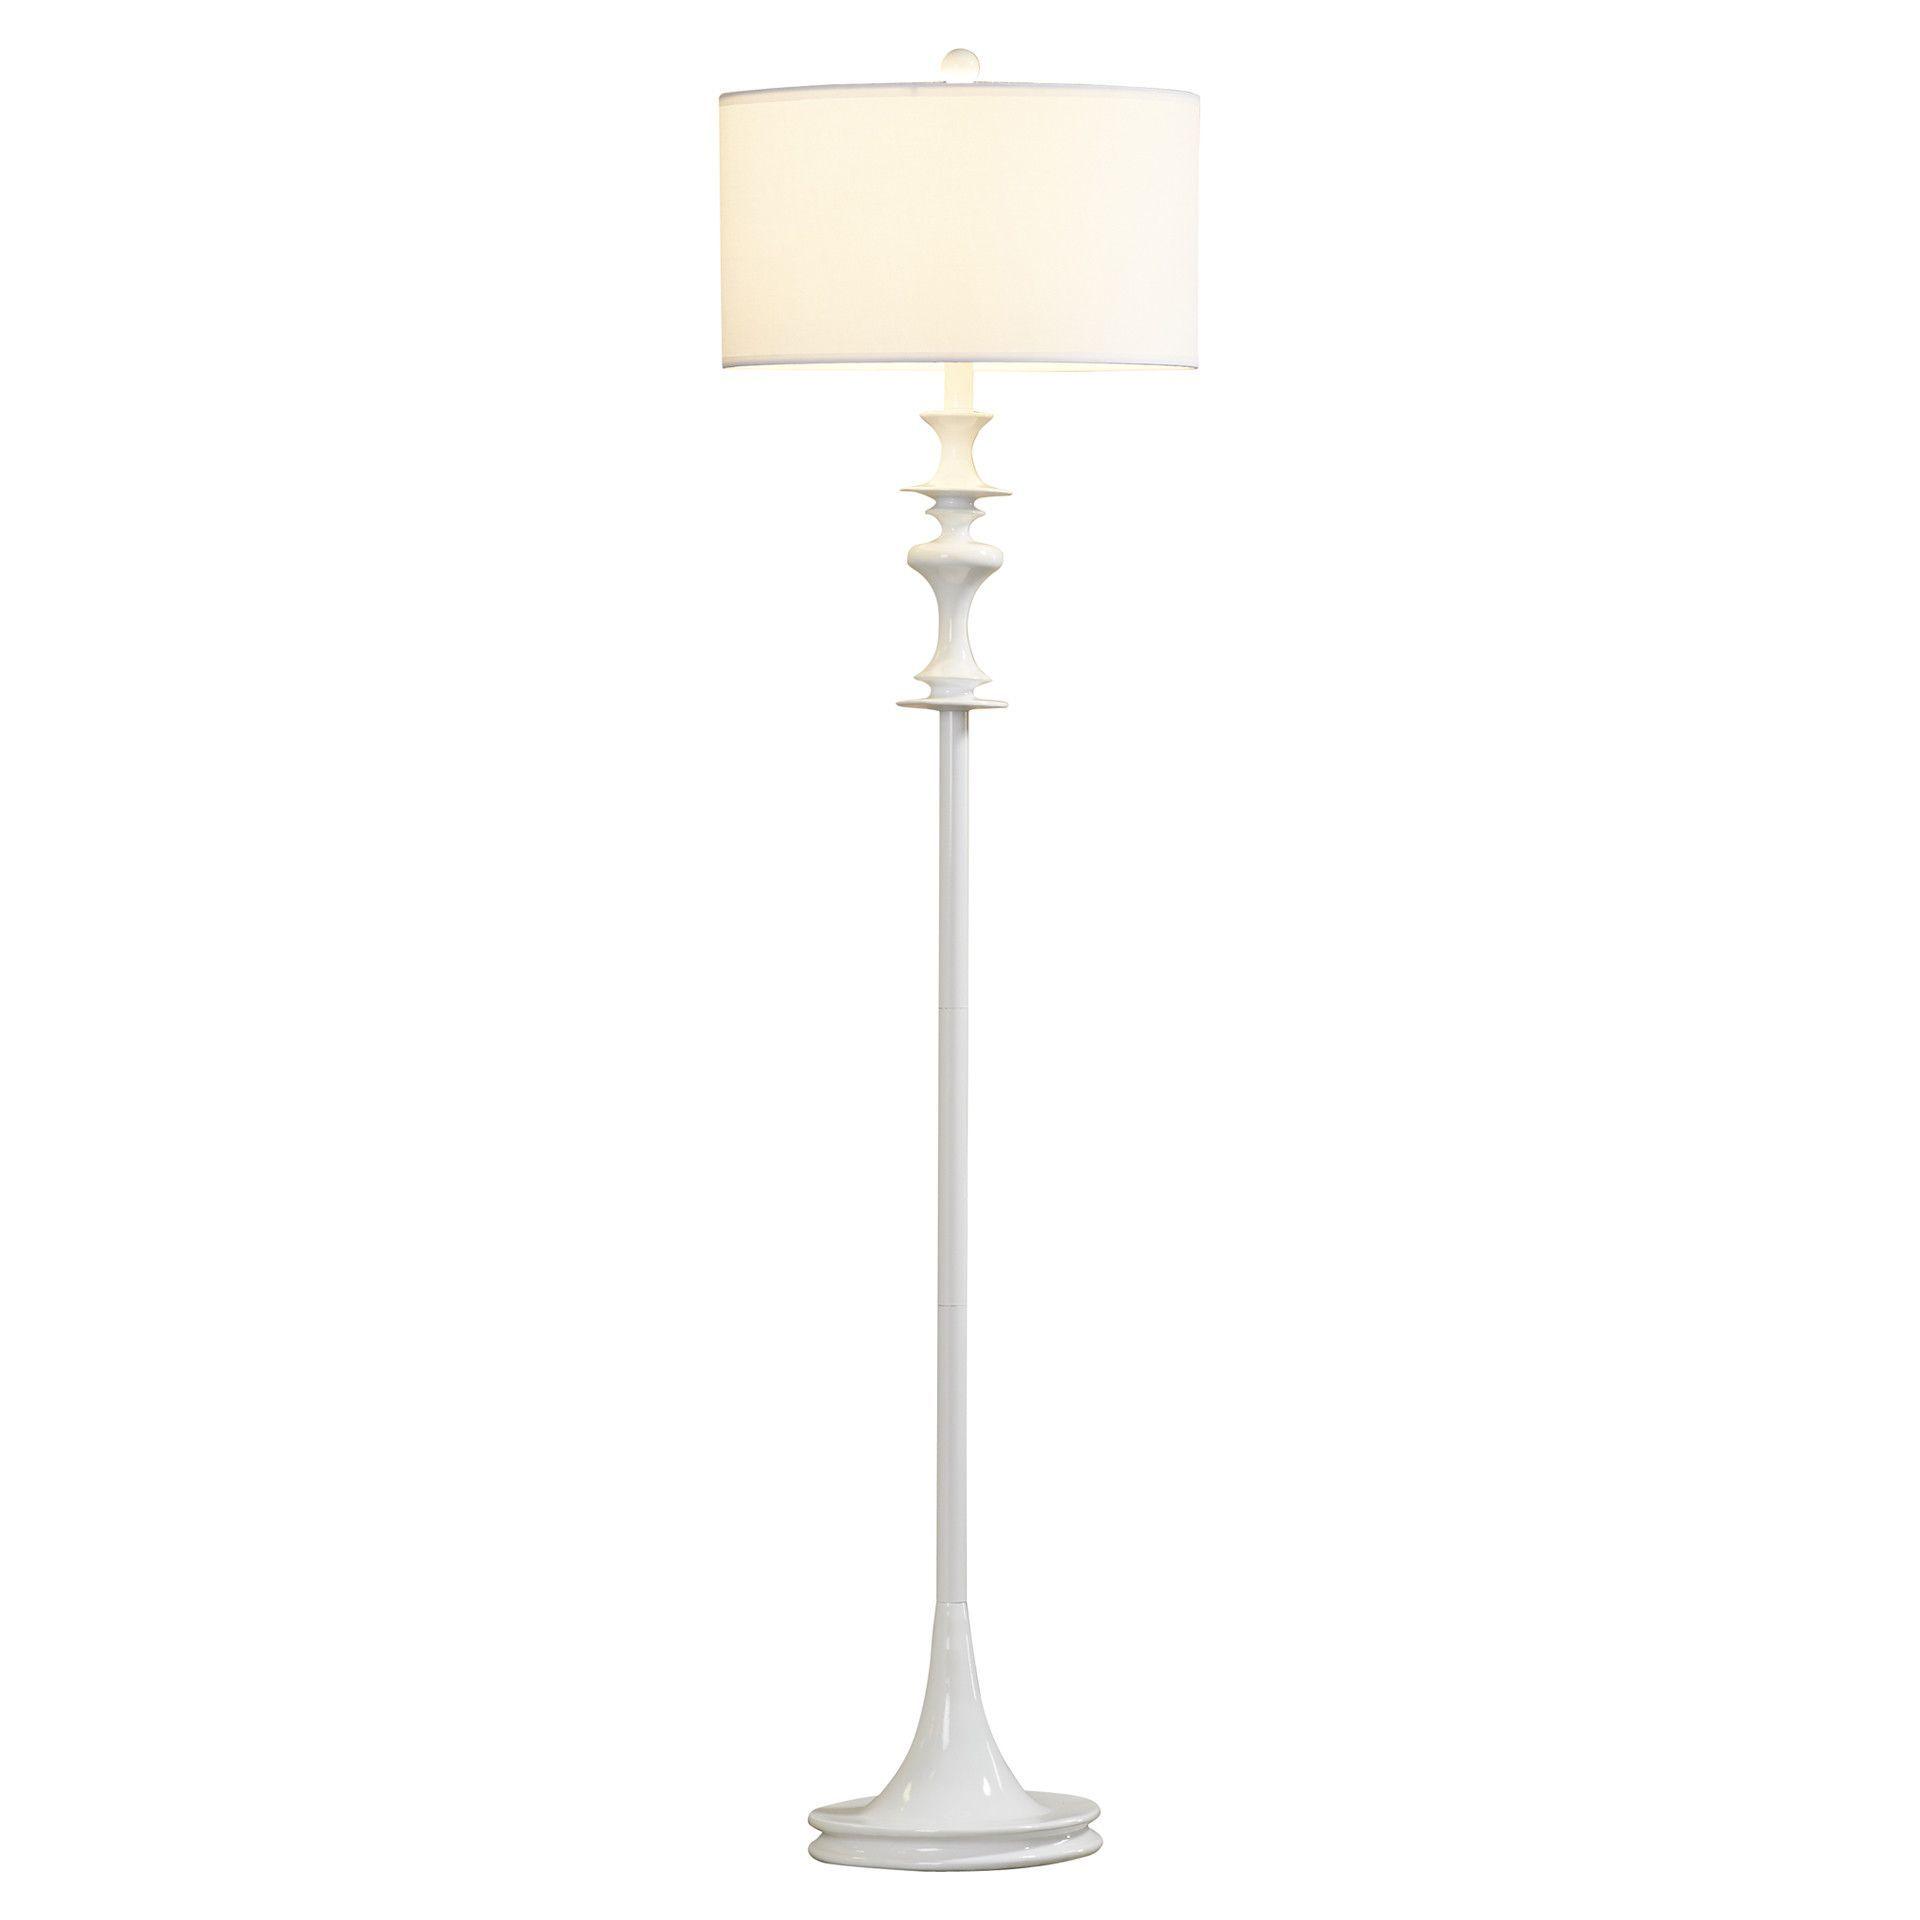 Henley In Arden 60 Floor Lamp Products White Floor Lamp in size 1920 X 1920